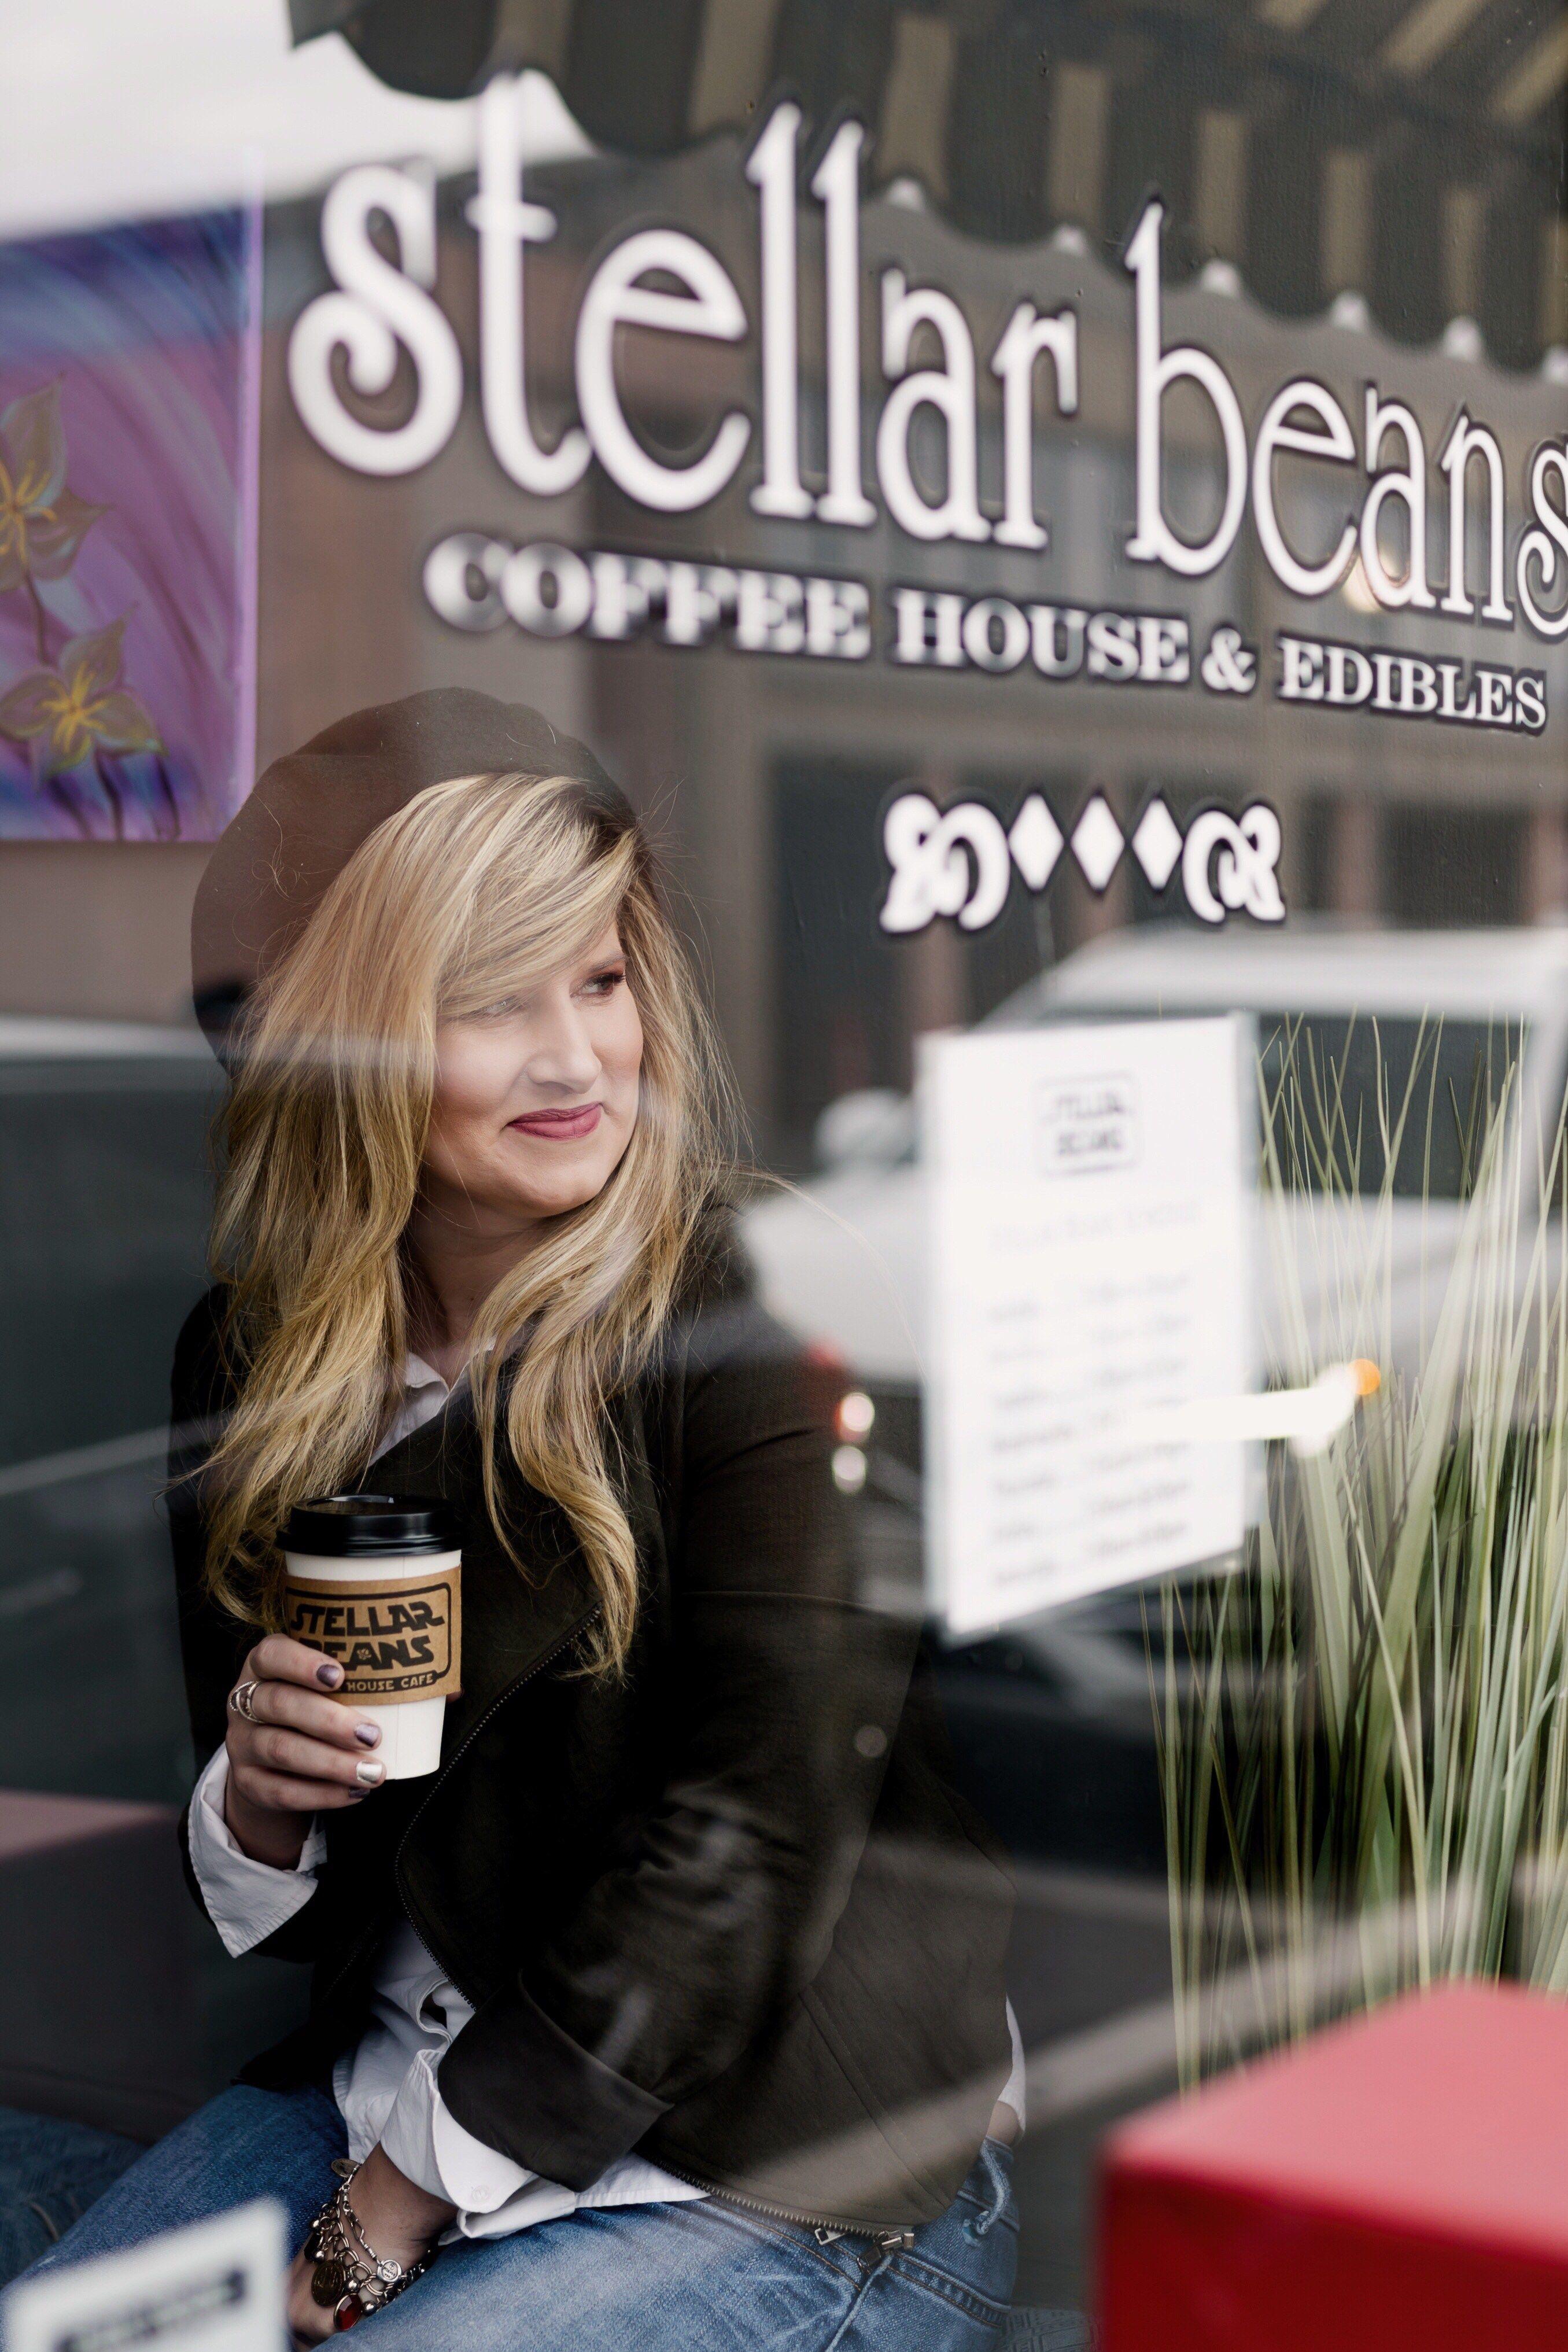 Stellar Beans Coffeehouse Cafe